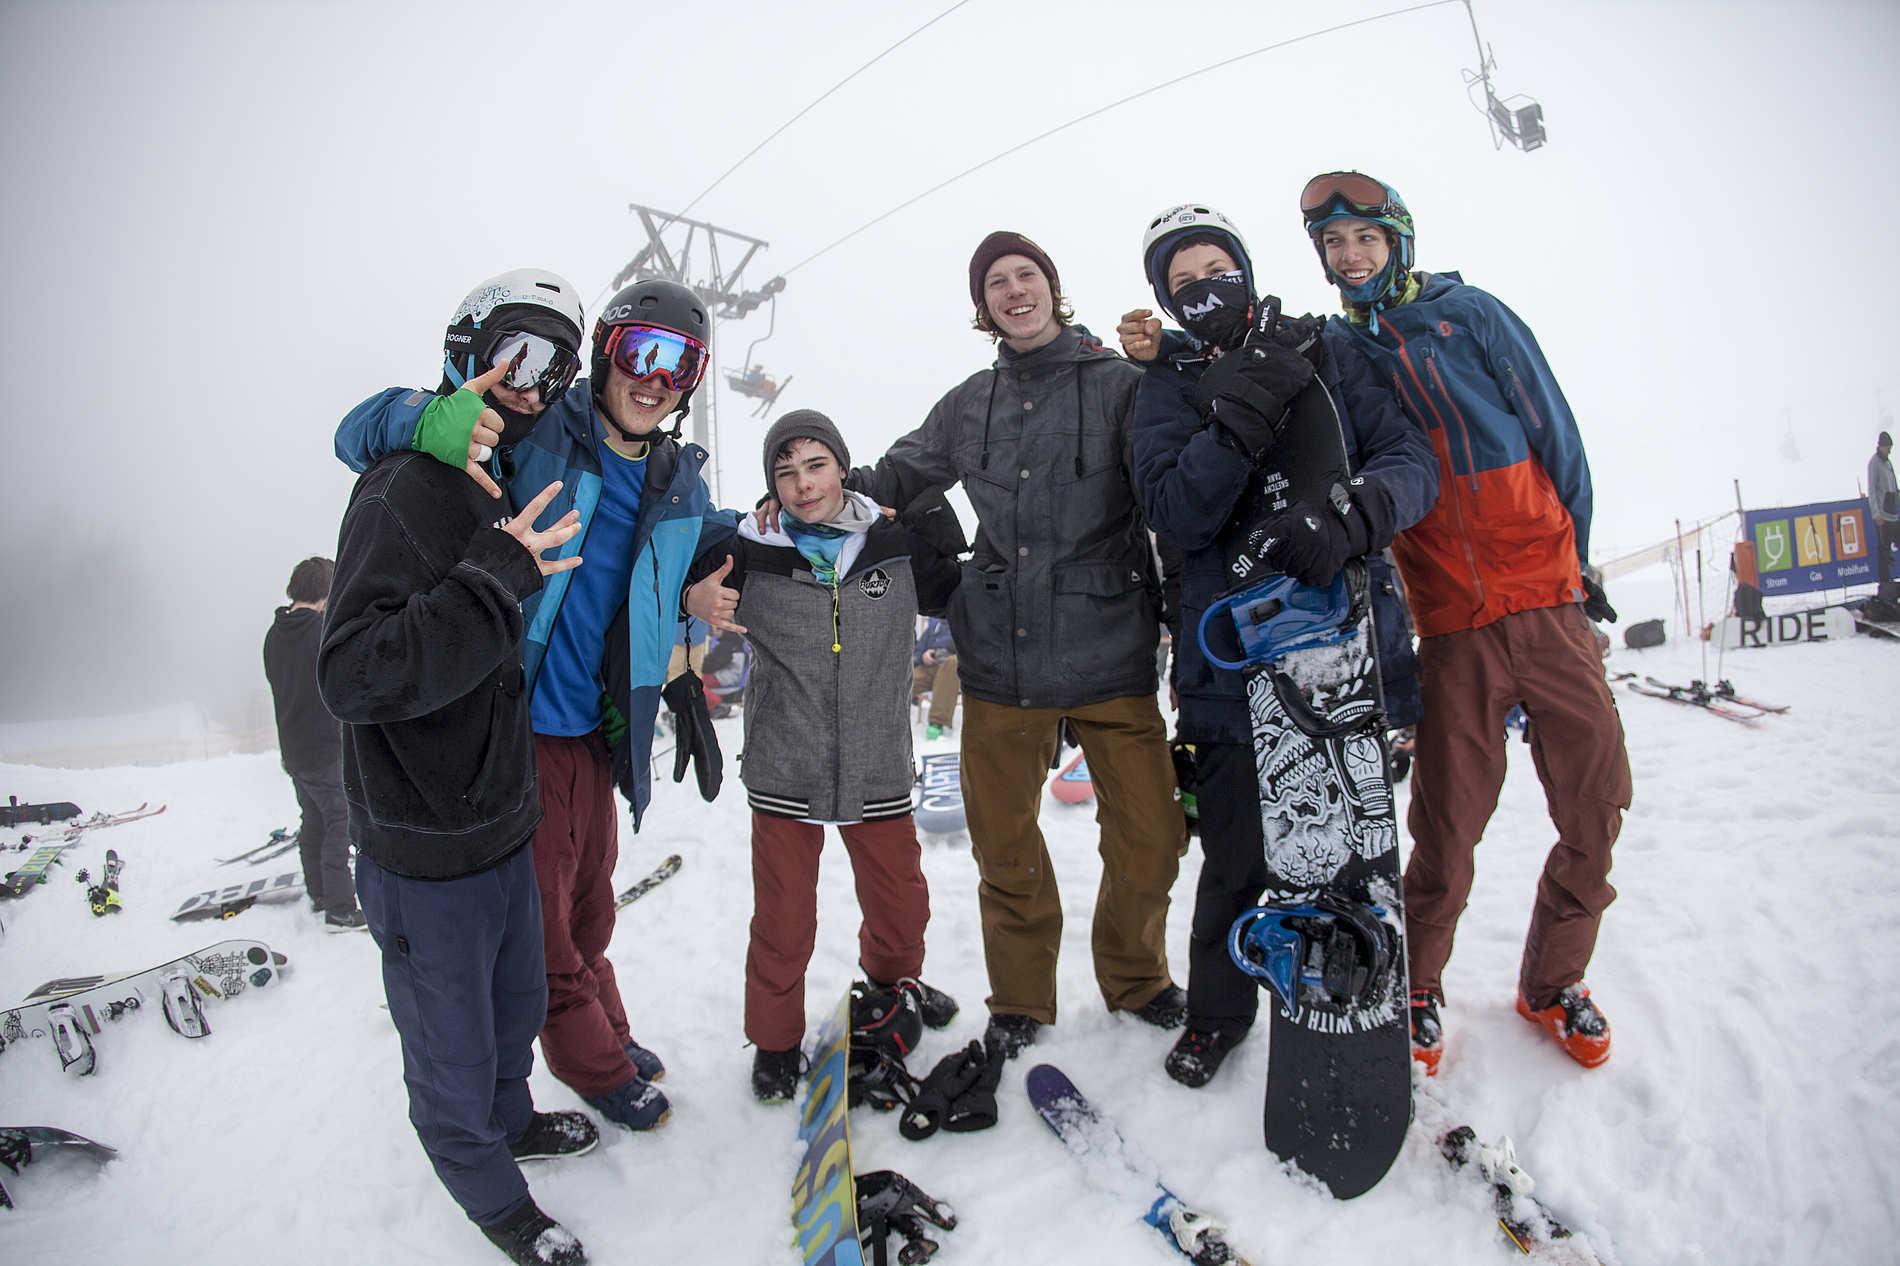 web snowpark feldberg 17 03 2018 lifestyle fs sb martin herrmann qparks 3